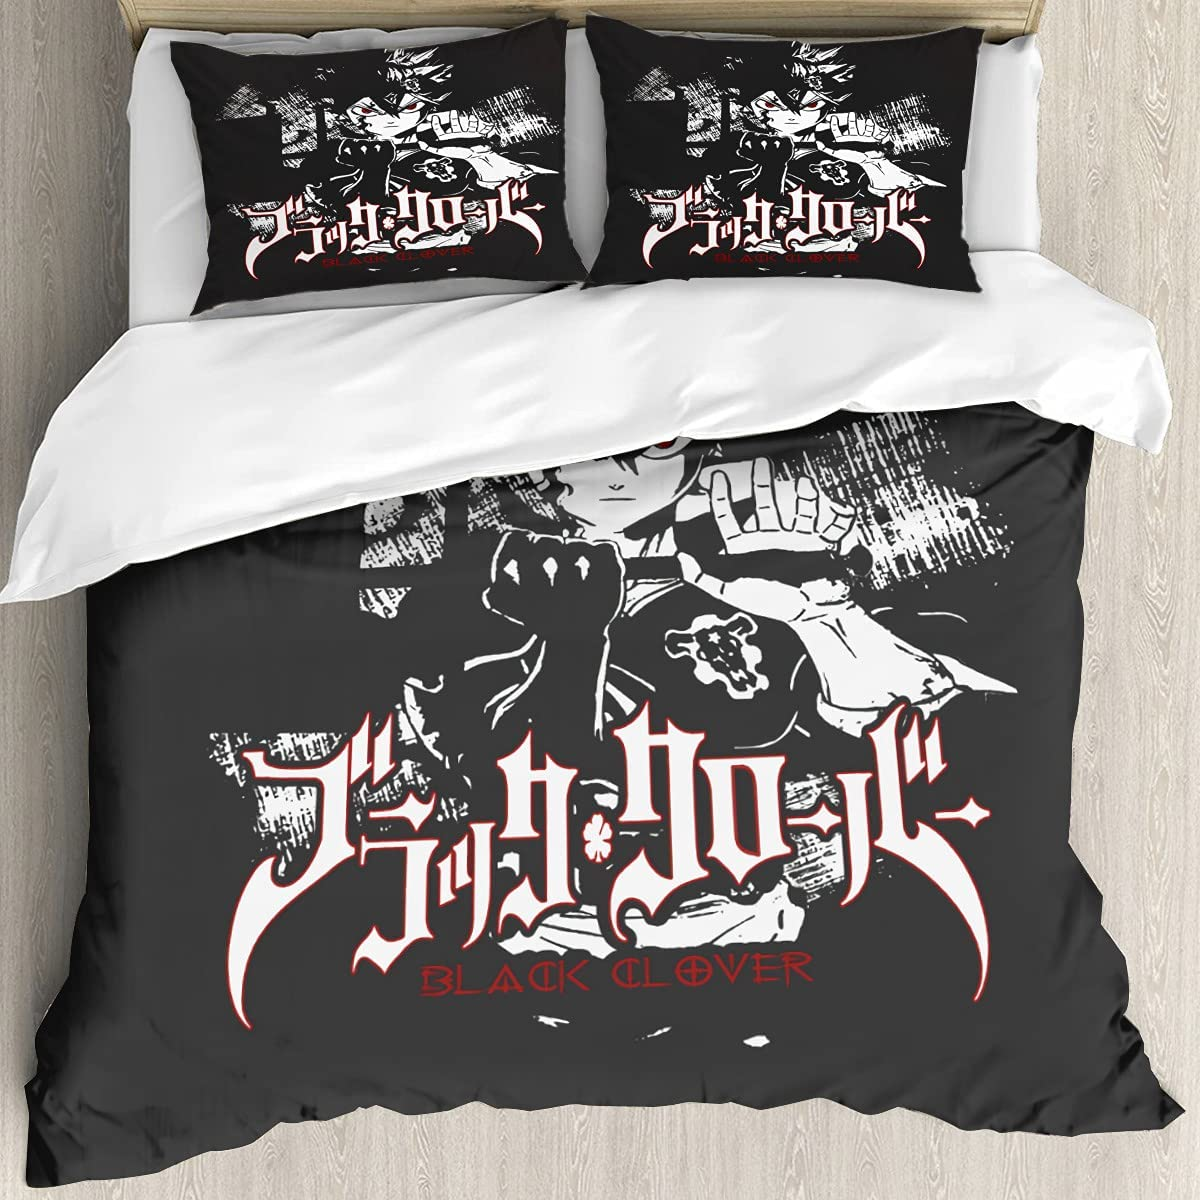 yiliusu-Black Clover Aster-Printing Quilt 2021 model Cover Siz Set Twin Bed Nippon regular agency